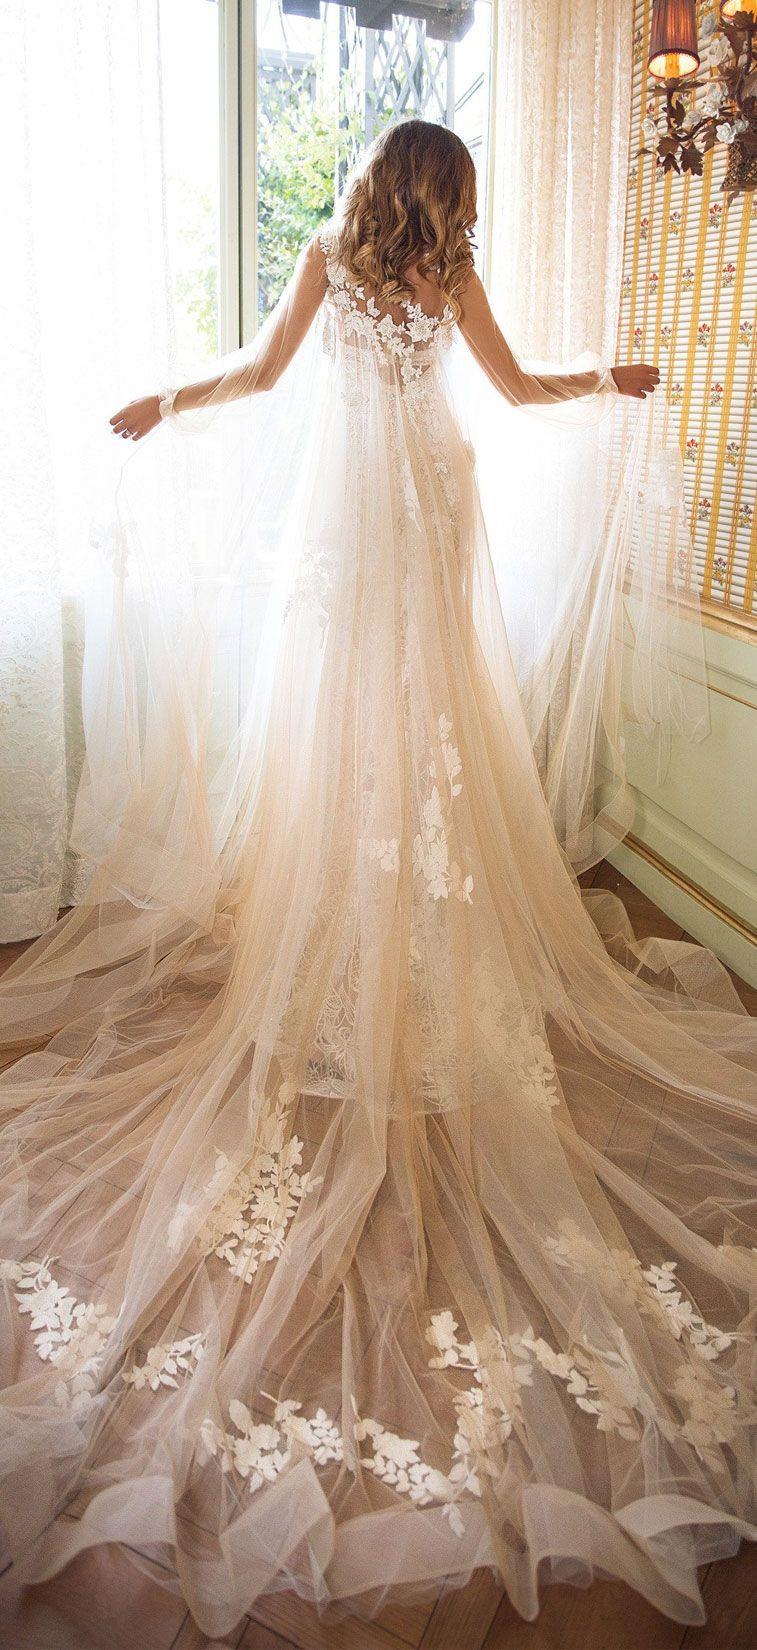 Sweetheart neckline sleeveless heavy embellishment sheath wedding dress : Milla Nova wedding dress #weddingdress #weddinggown #wedding #bridedress